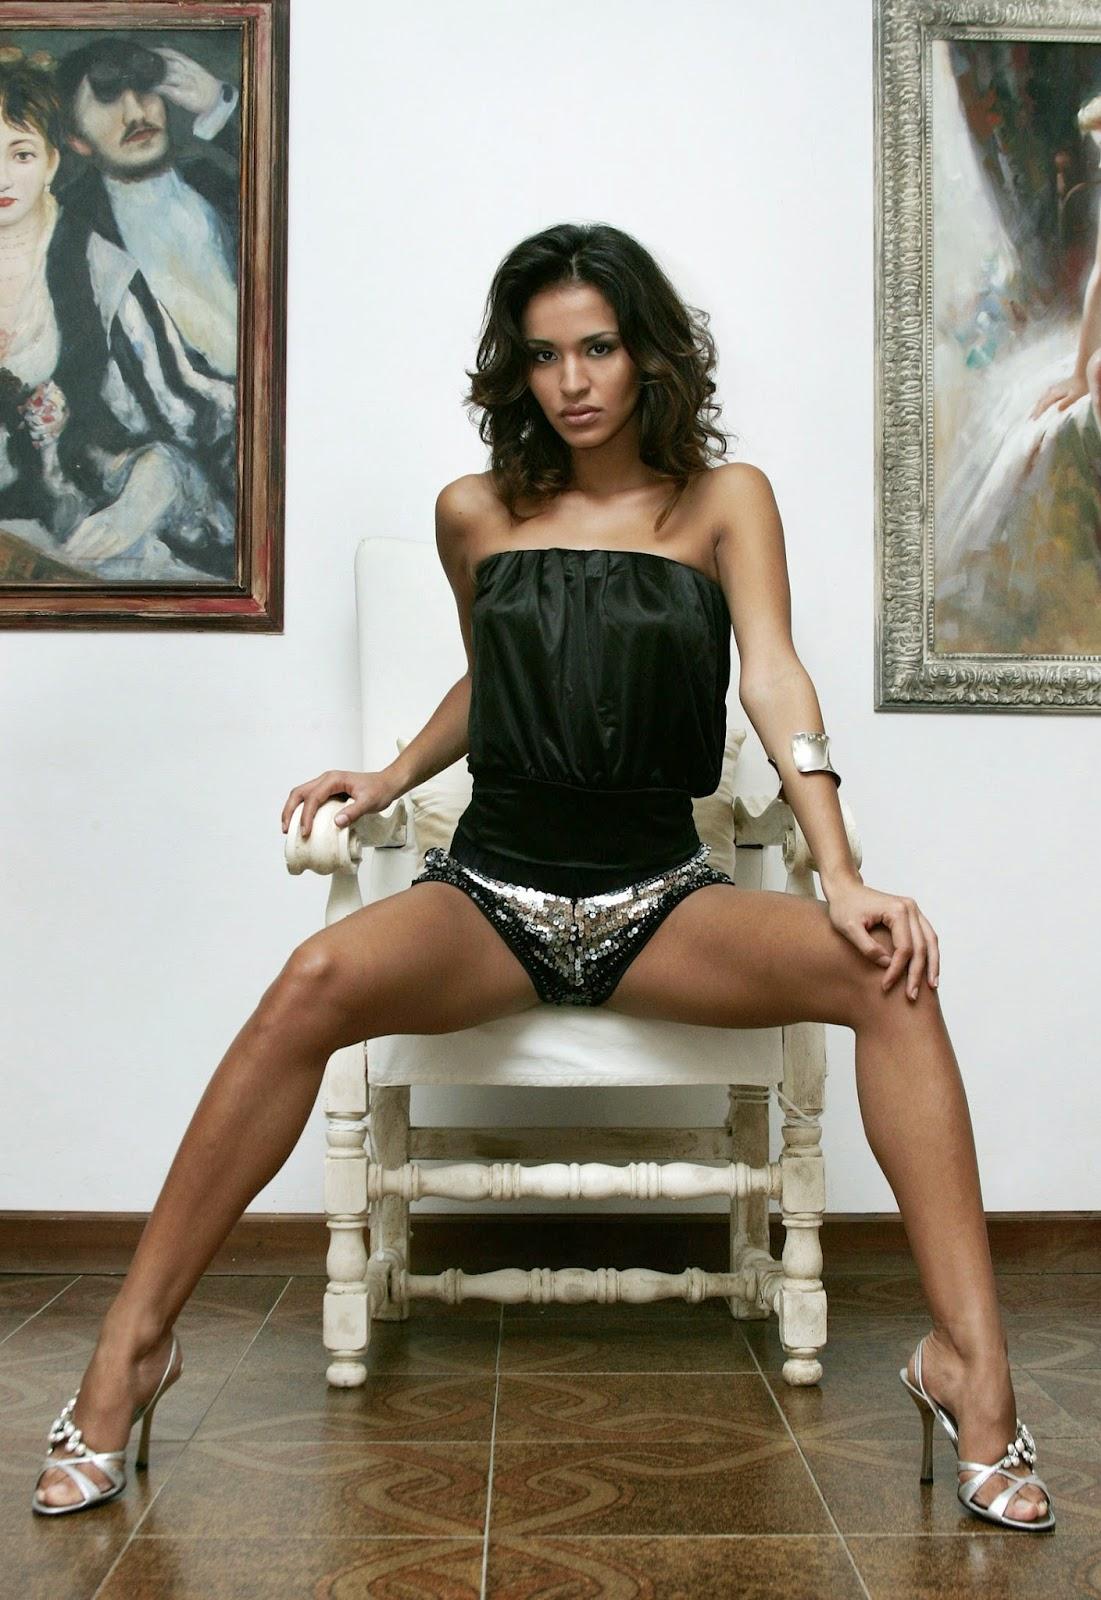 Leila Ben Khalifa en top et culotte